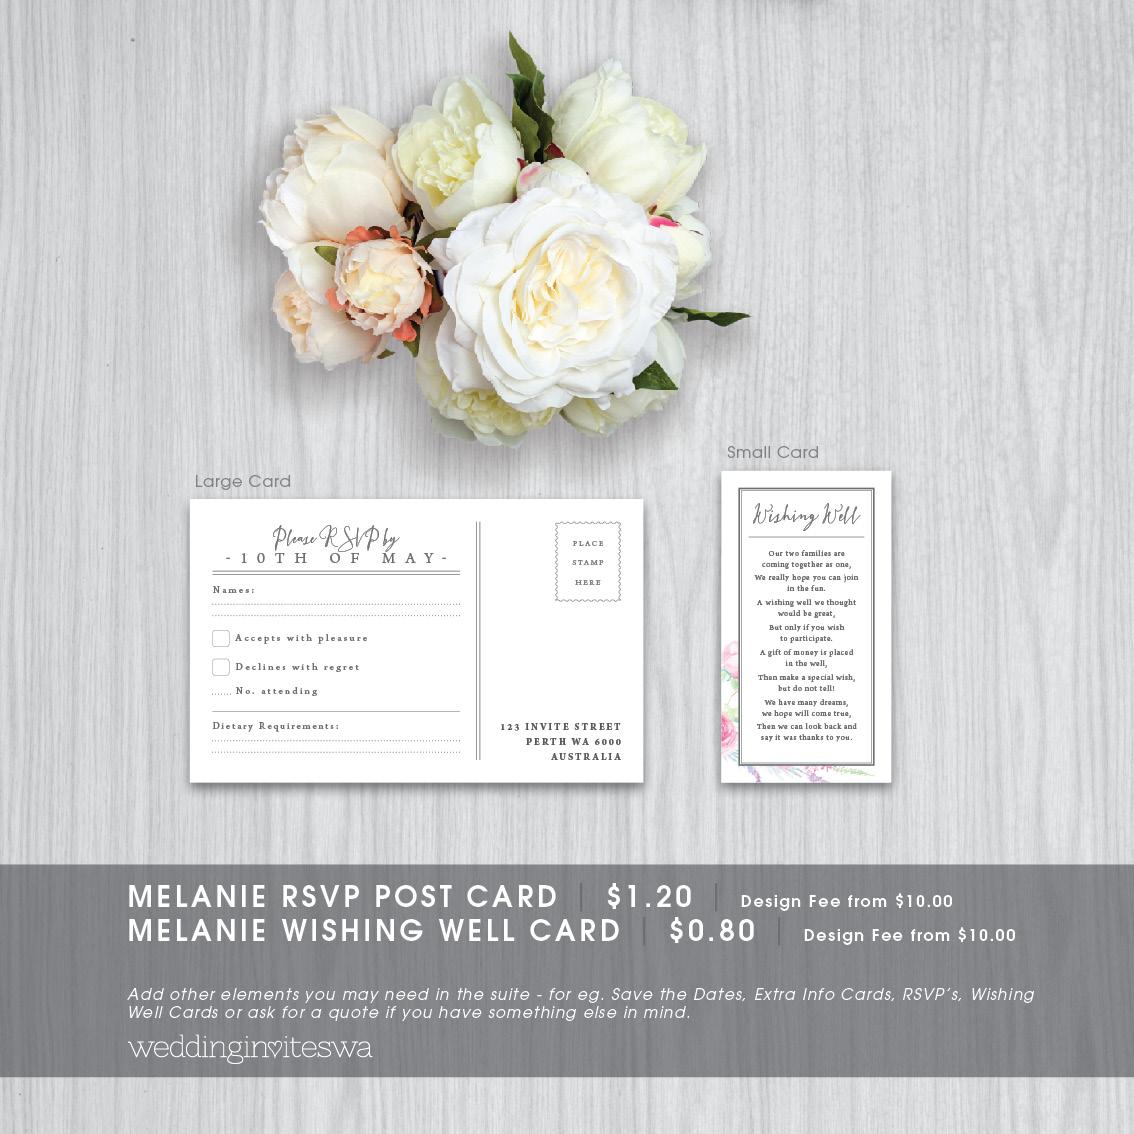 MELANIE_extra cards